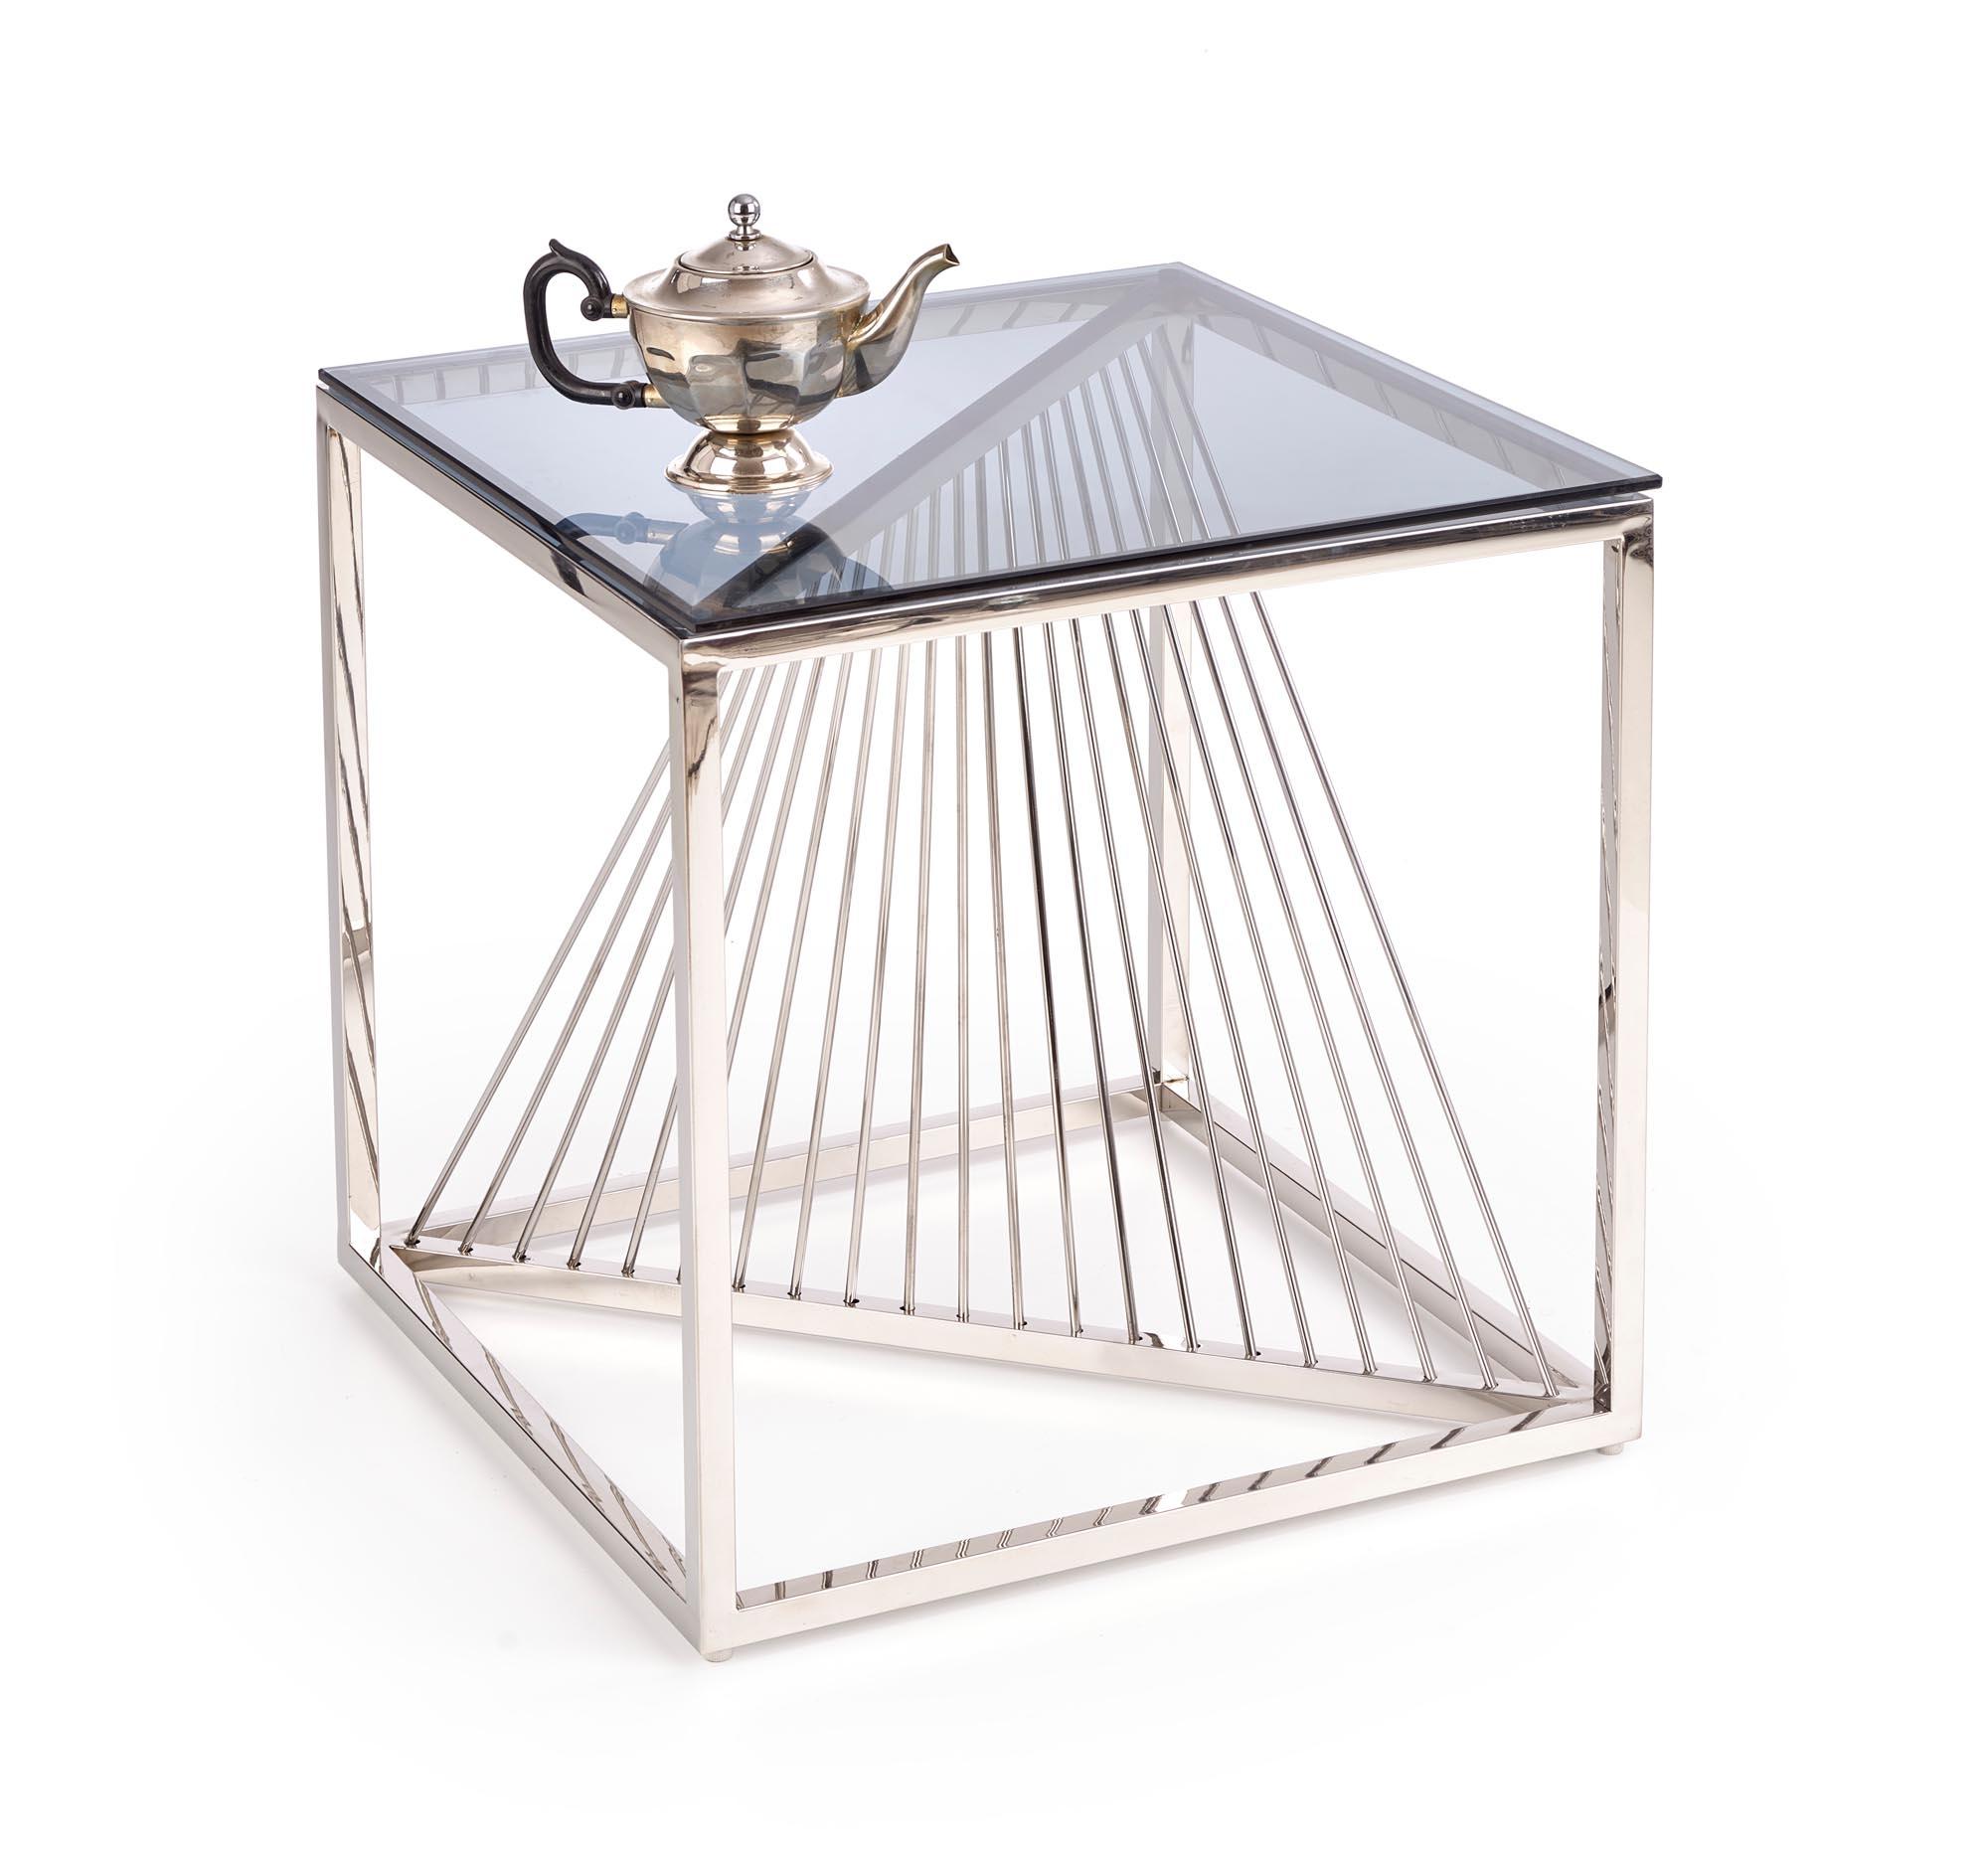 Masa de cafea din sticla si metal Infinity Square Crom, L55xl55xH55 cm imagine